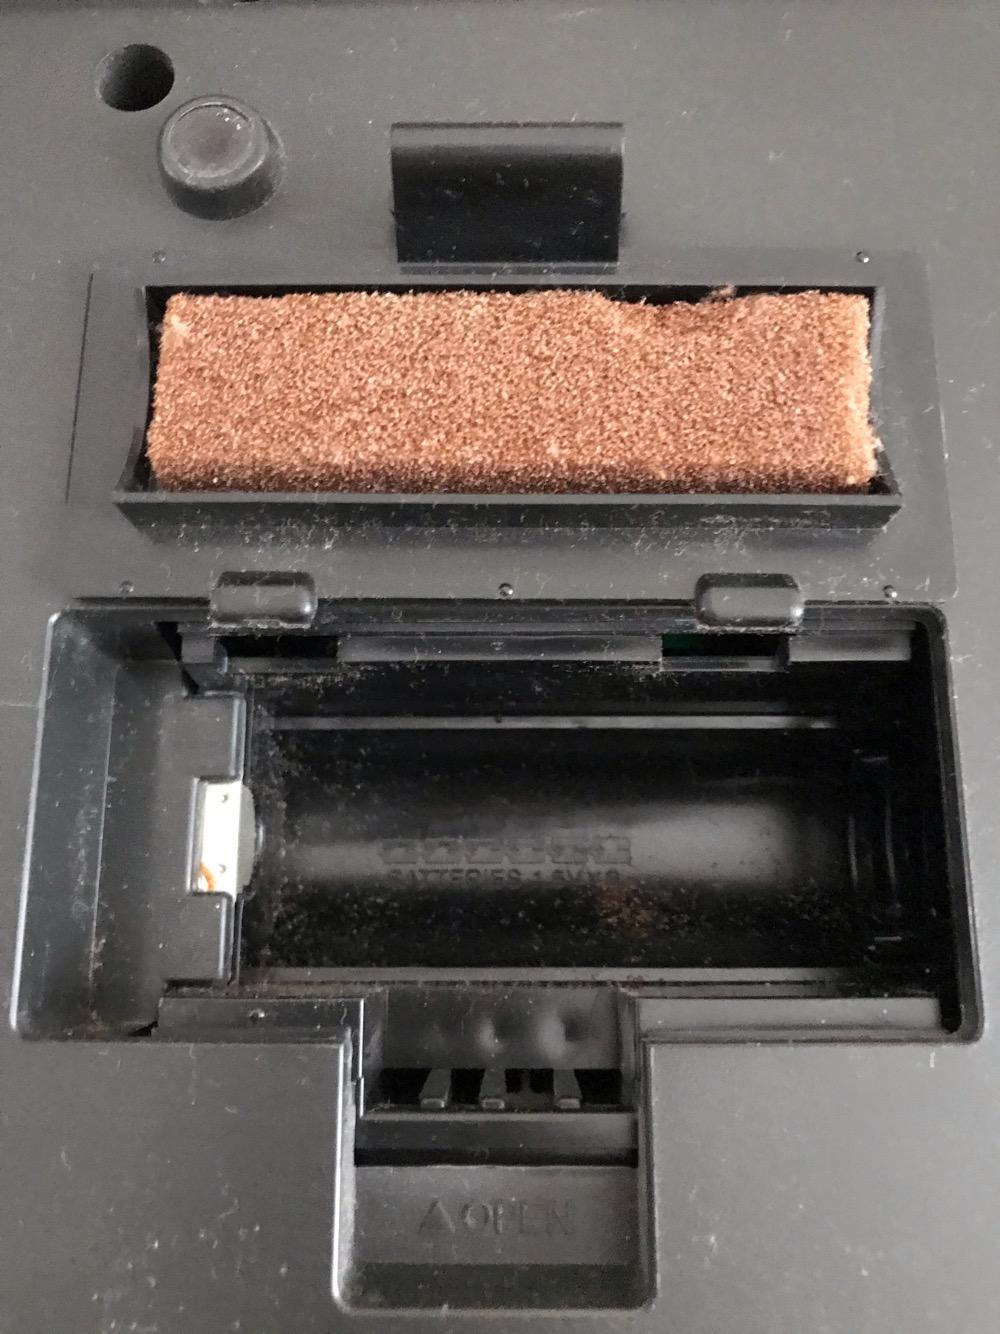 YAMAHA PORTATONE PSR-18の乾電池を入れる場所、乾電池の蓋の裏面